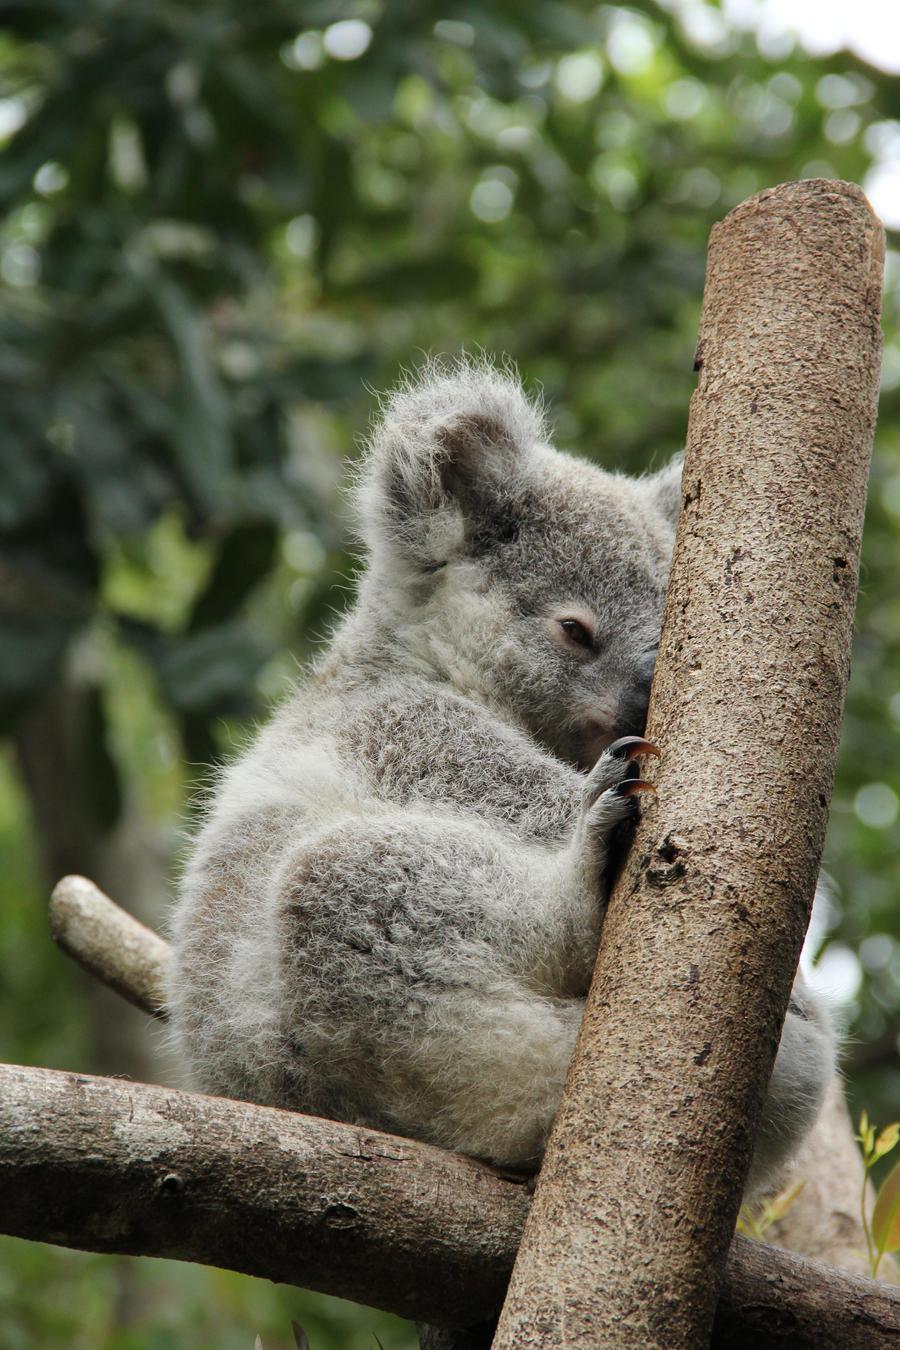 Baby koala 2 by bilbypdalgyte on deviantart - Pics of baby koalas ...